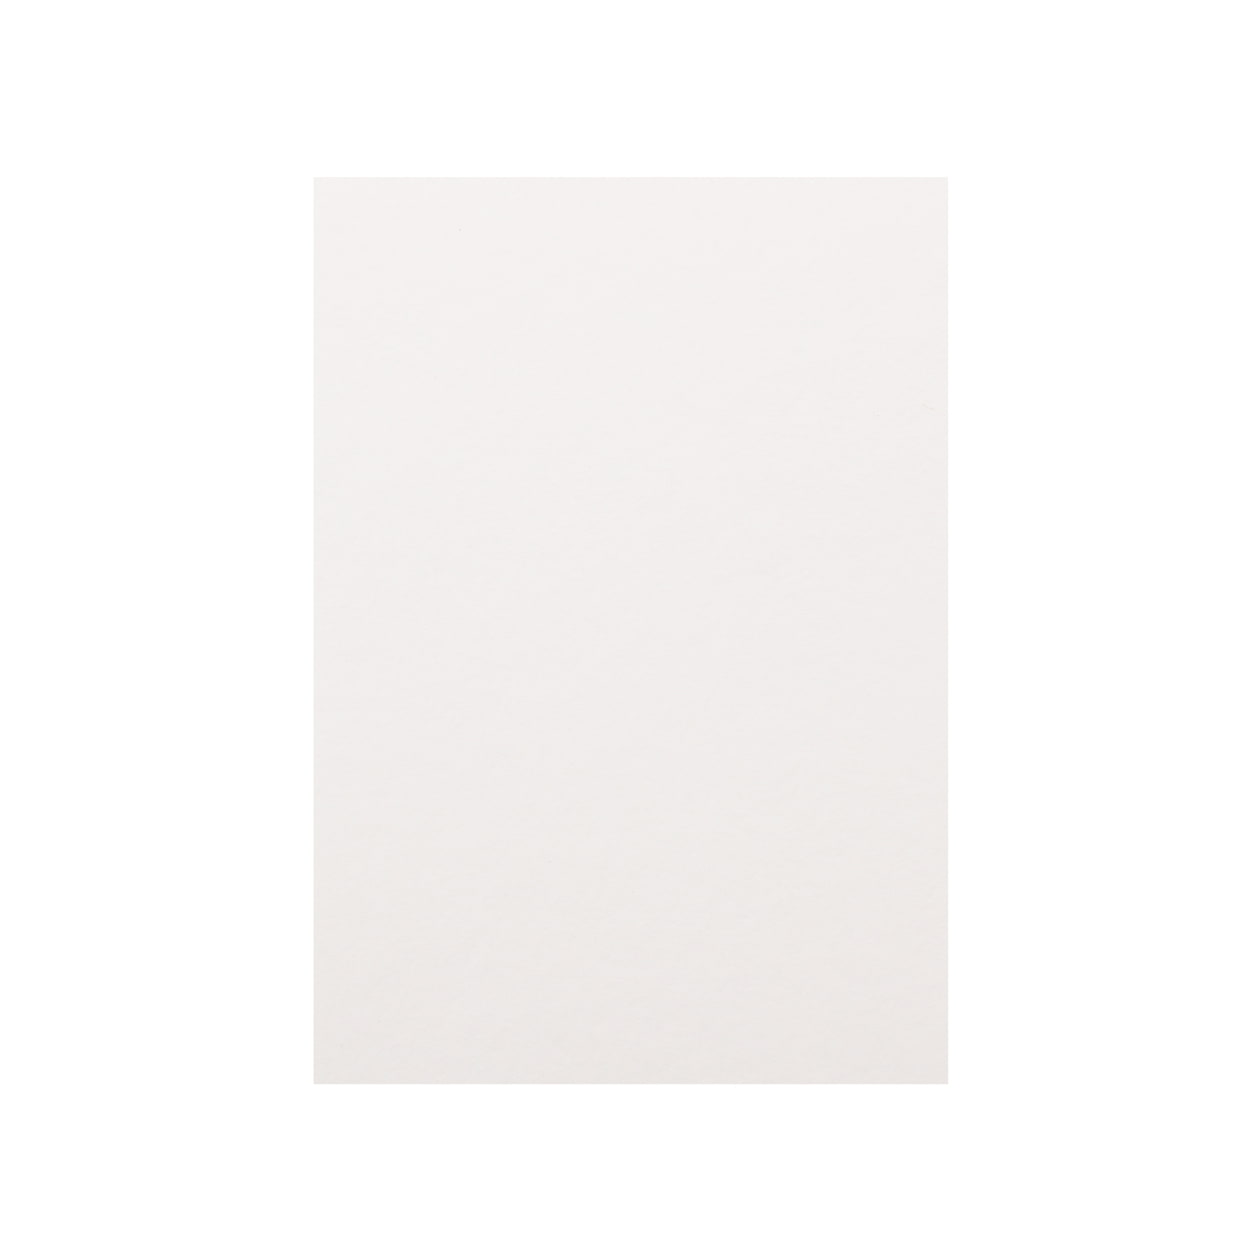 Pカード HAGURUMA Basic プレインホワイト 260g